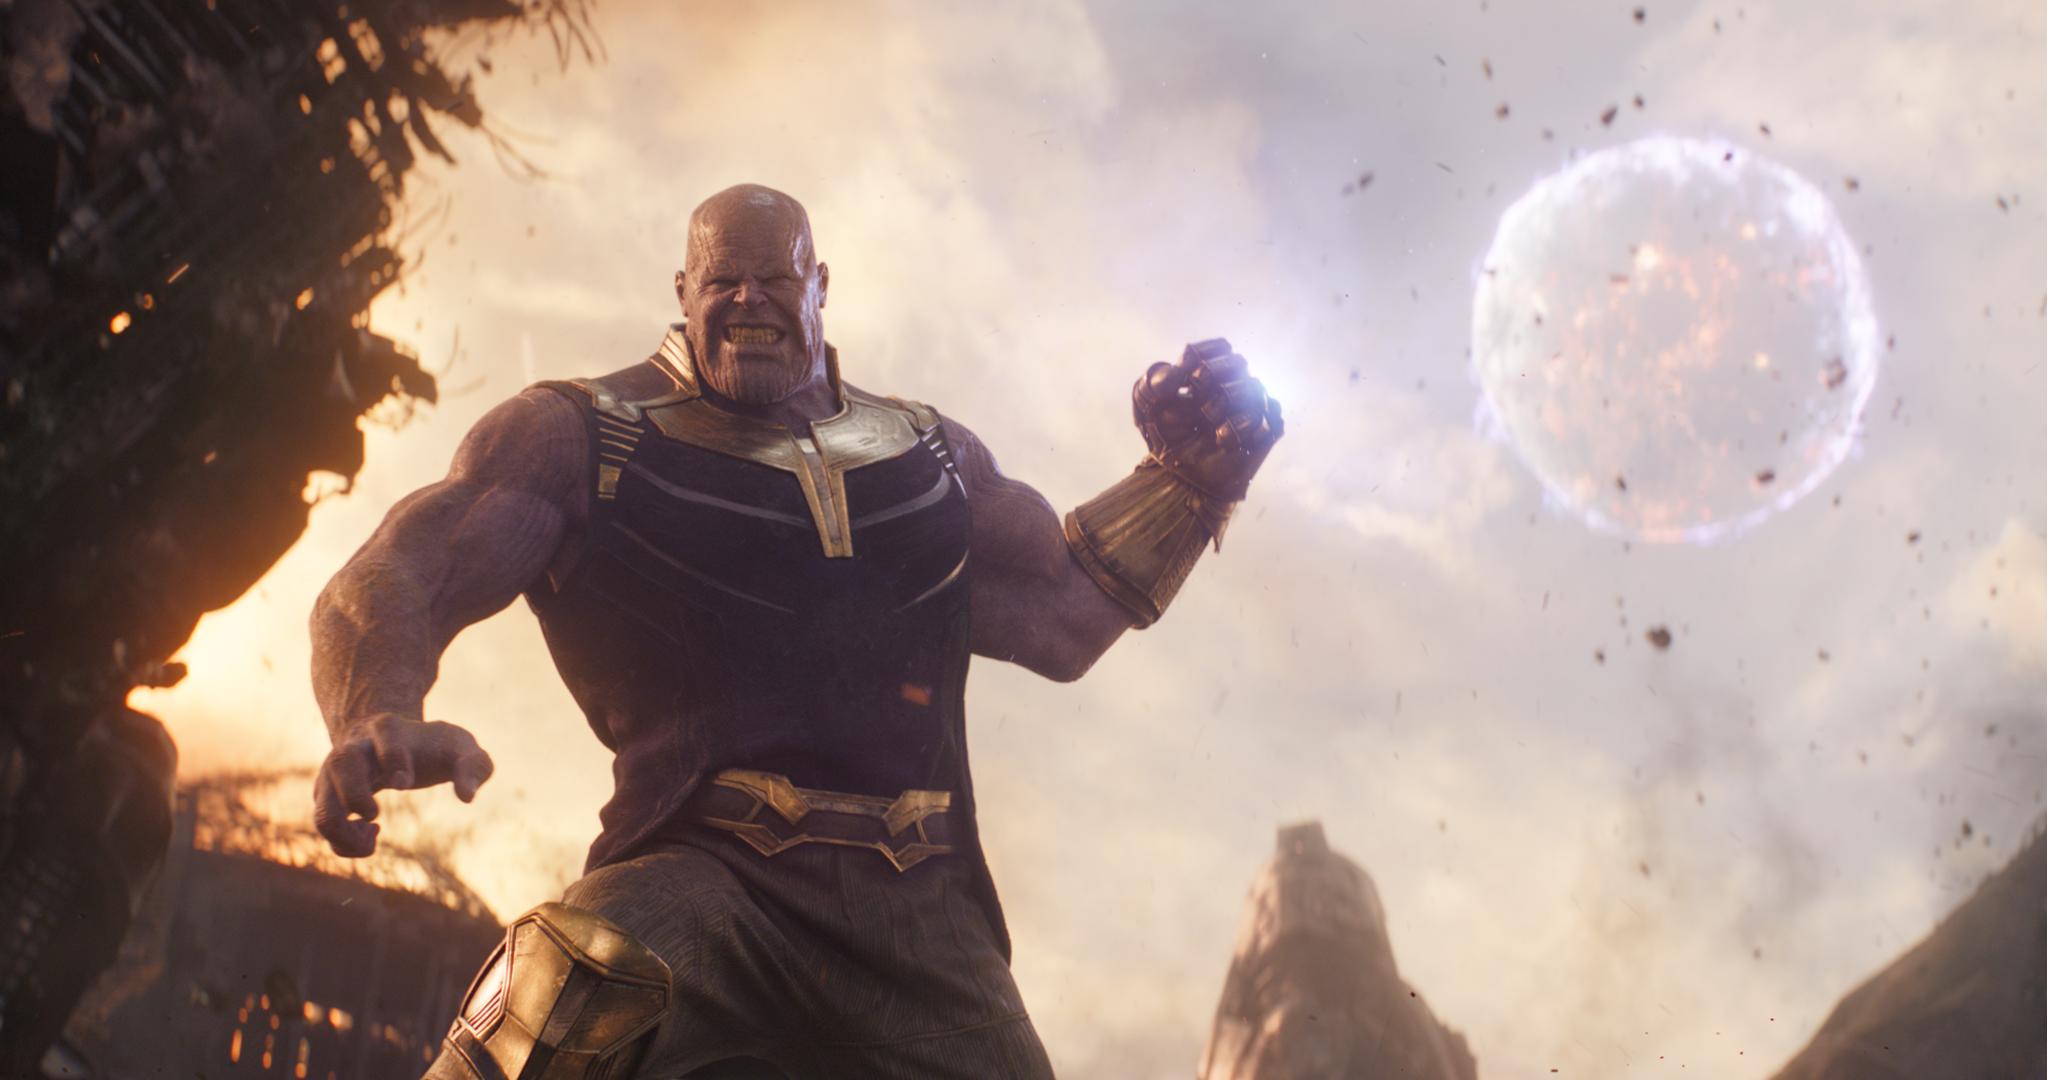 Thanos from Disney's Avengers: Infinity War.